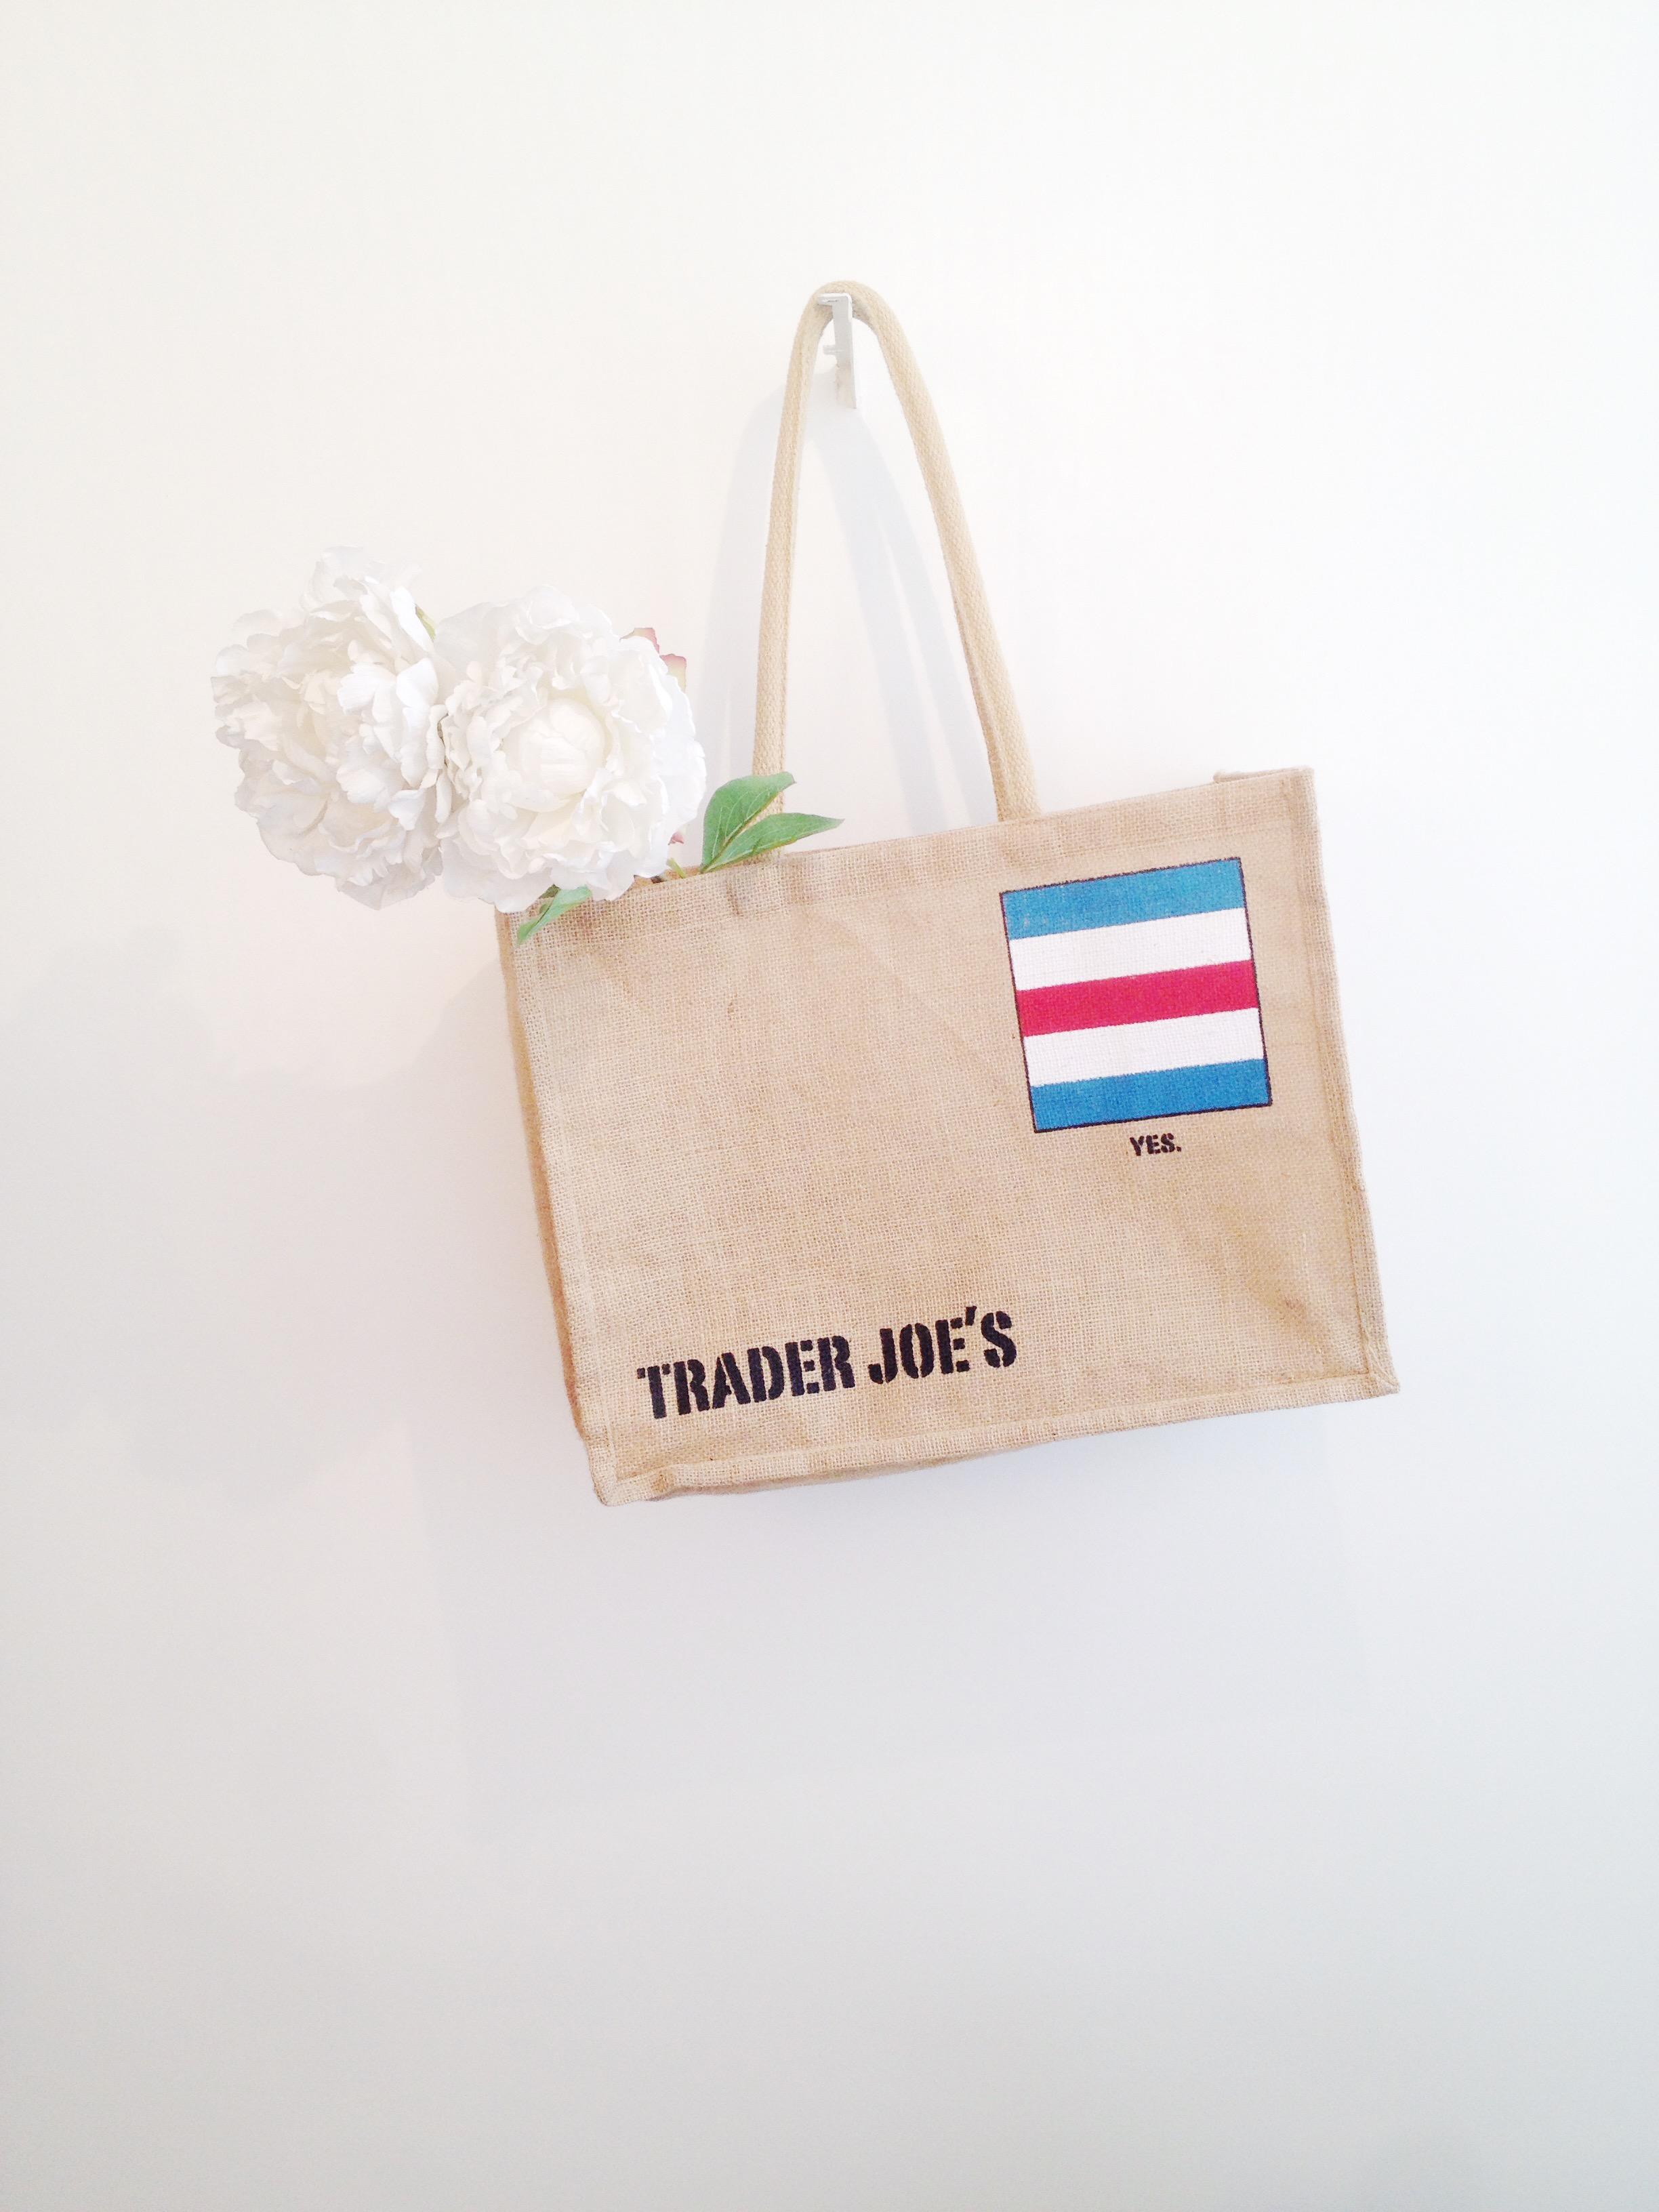 [[Talking reusable bags on  Apartment Therapy . Pictured : The reusable bag I bought from Trader Joe's last November in LA///A propos de sacs réutilisables sur  Apartment Therapy . Photo : le sac réutilisable que j'ai acheté chez Trader Joe's à LA en novembre dernier]]